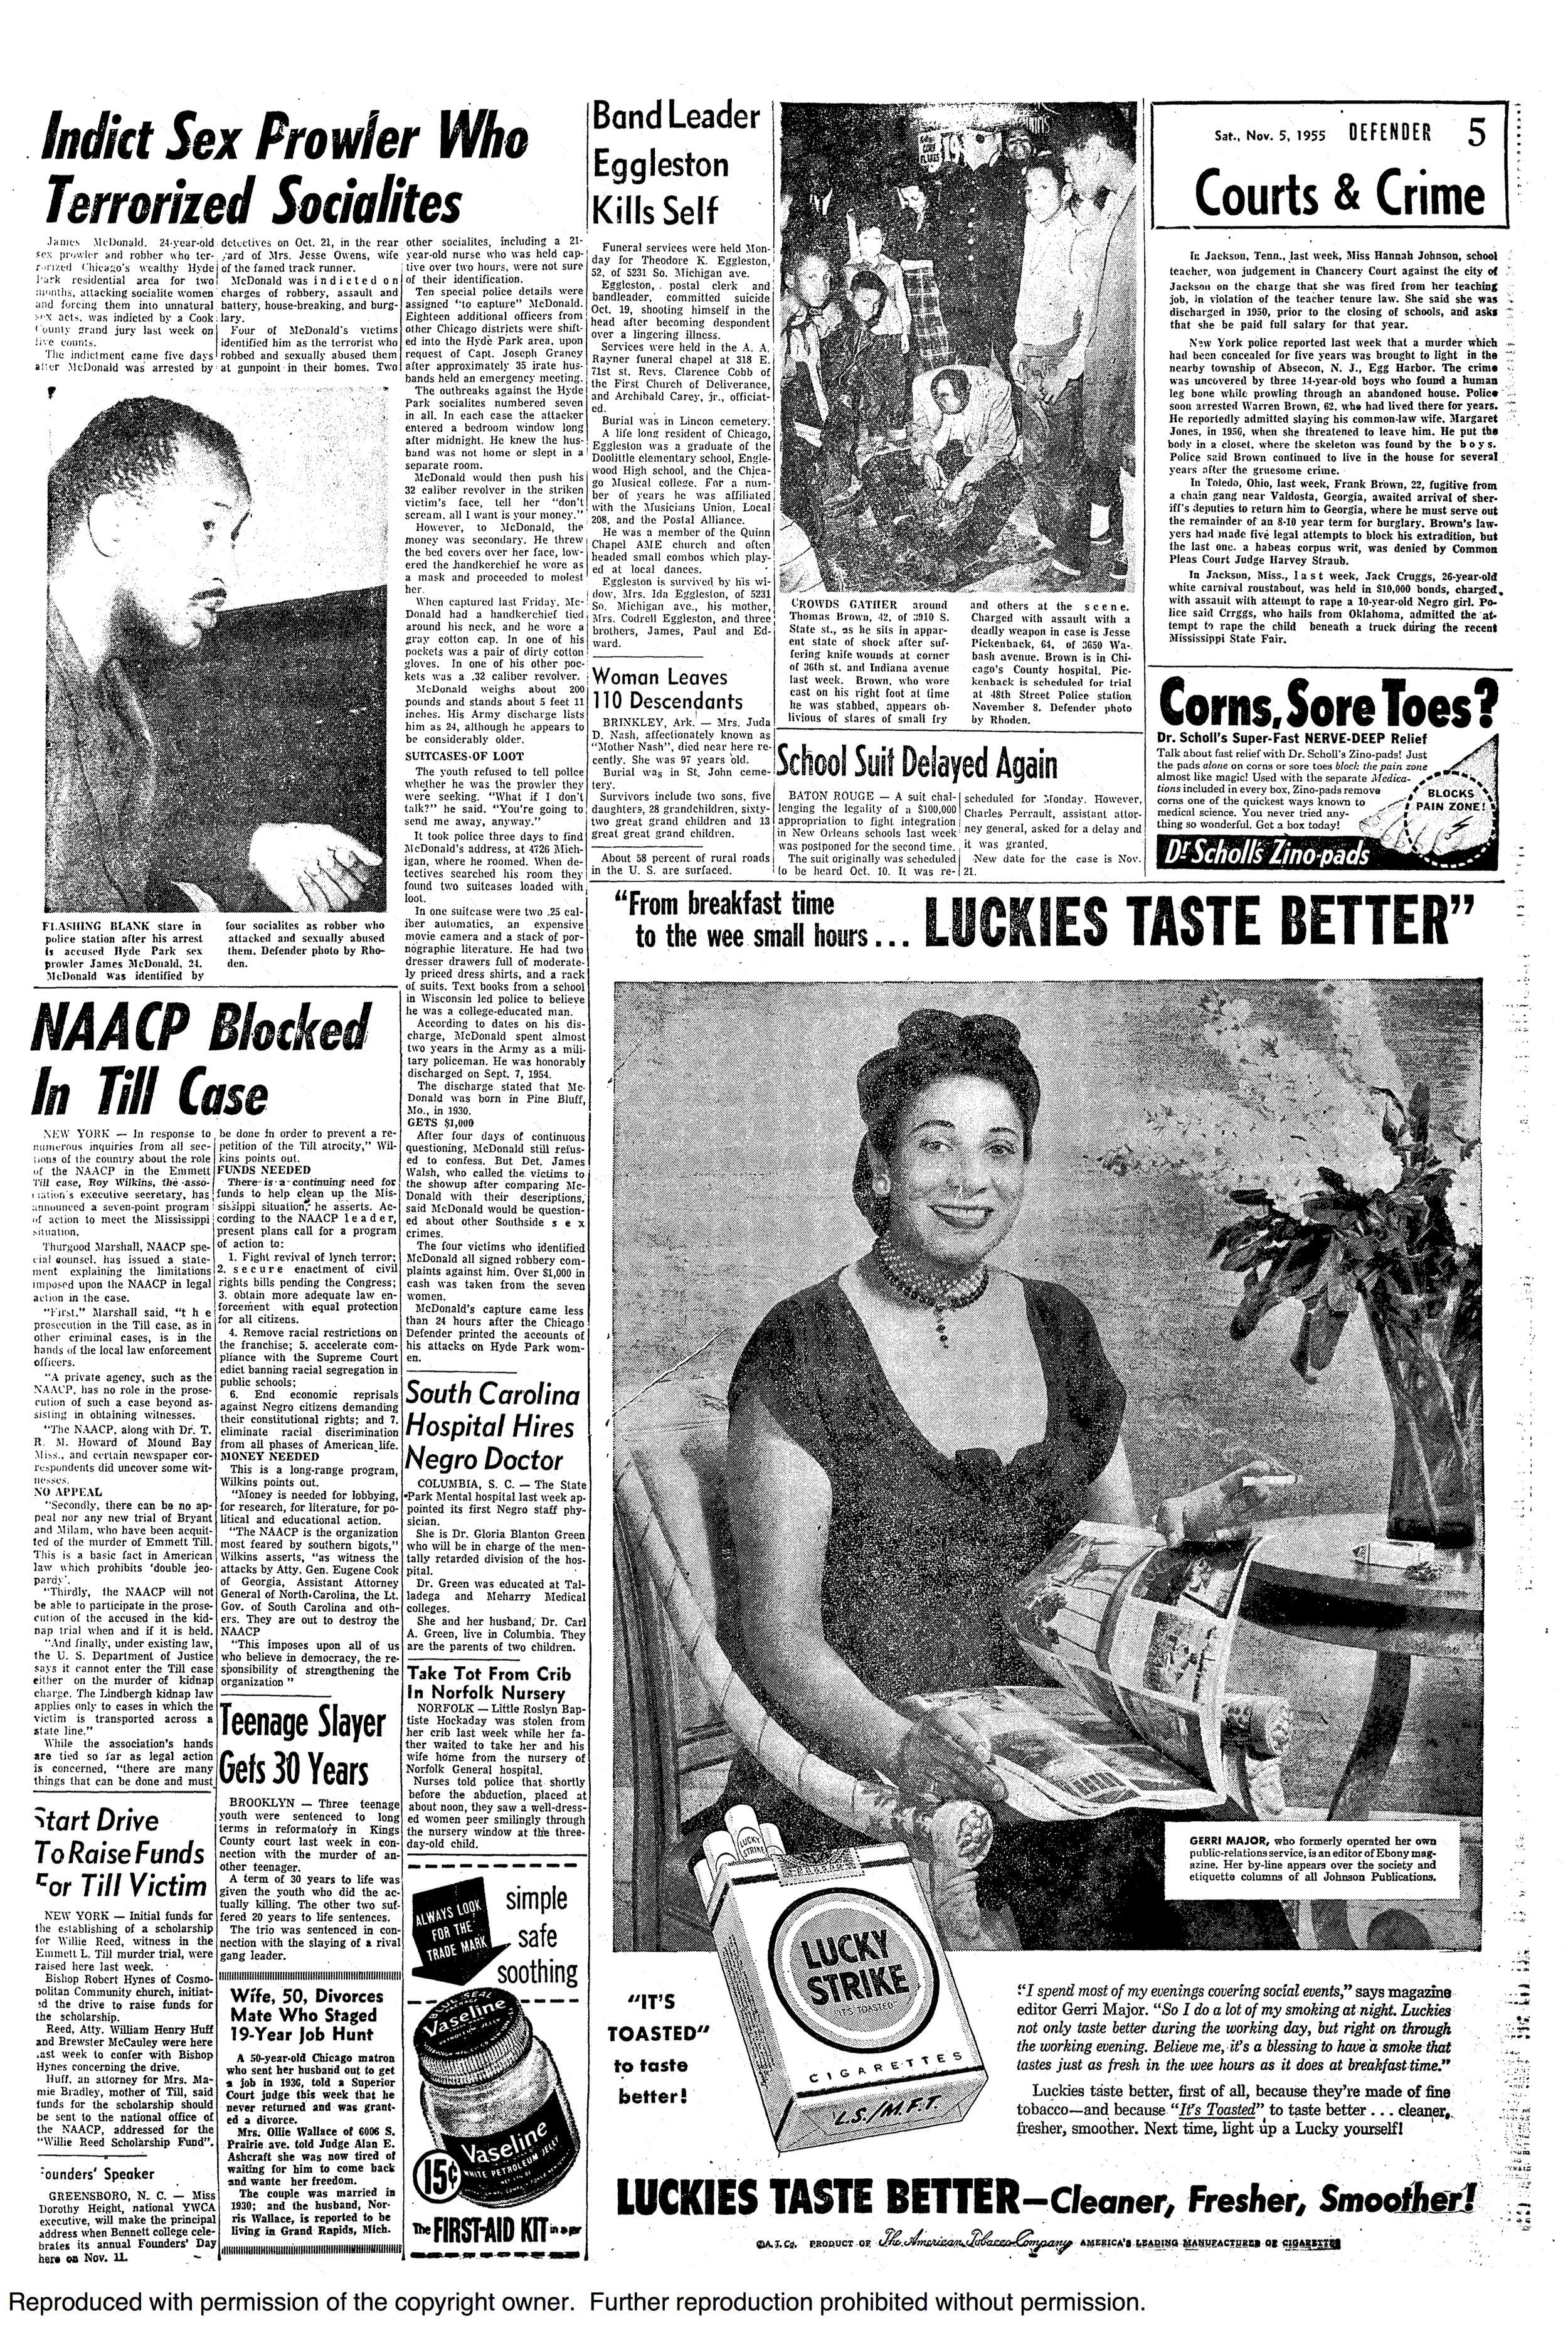 11.5.1955